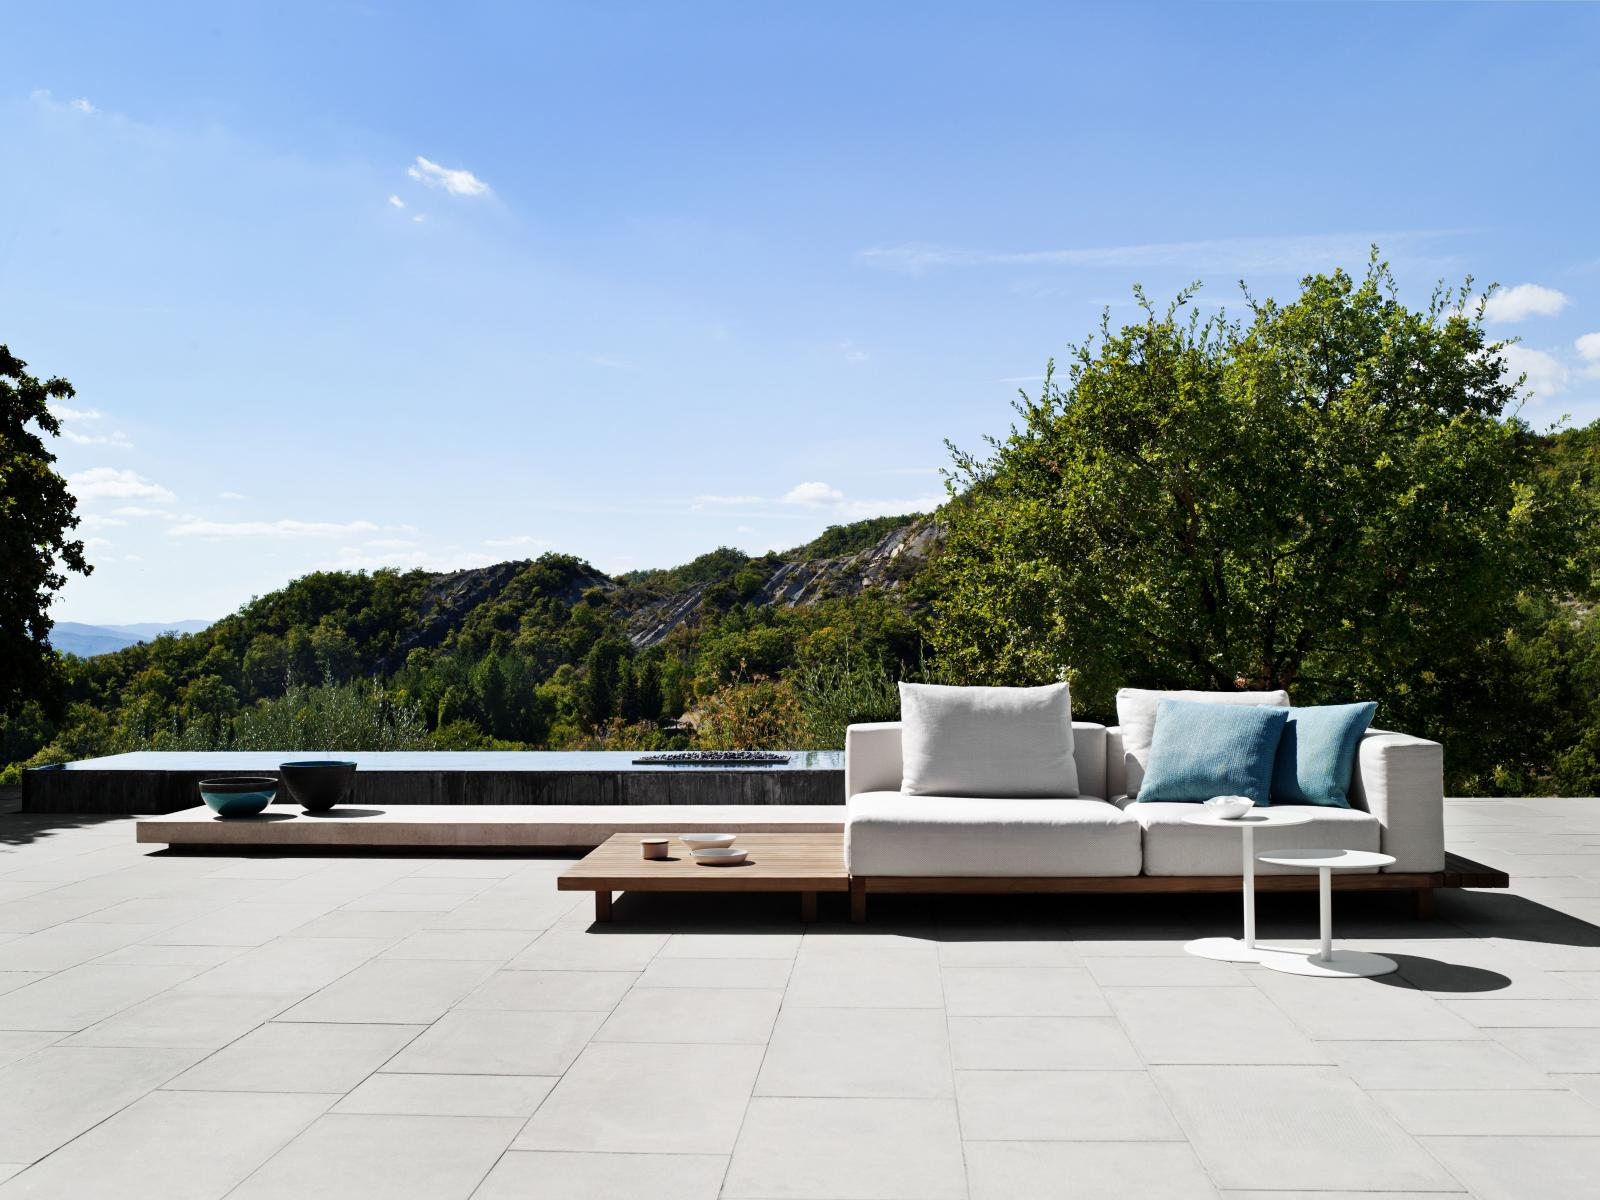 ideen : schönes ideen bad dachschruge innenraumgestaltung tipps ...